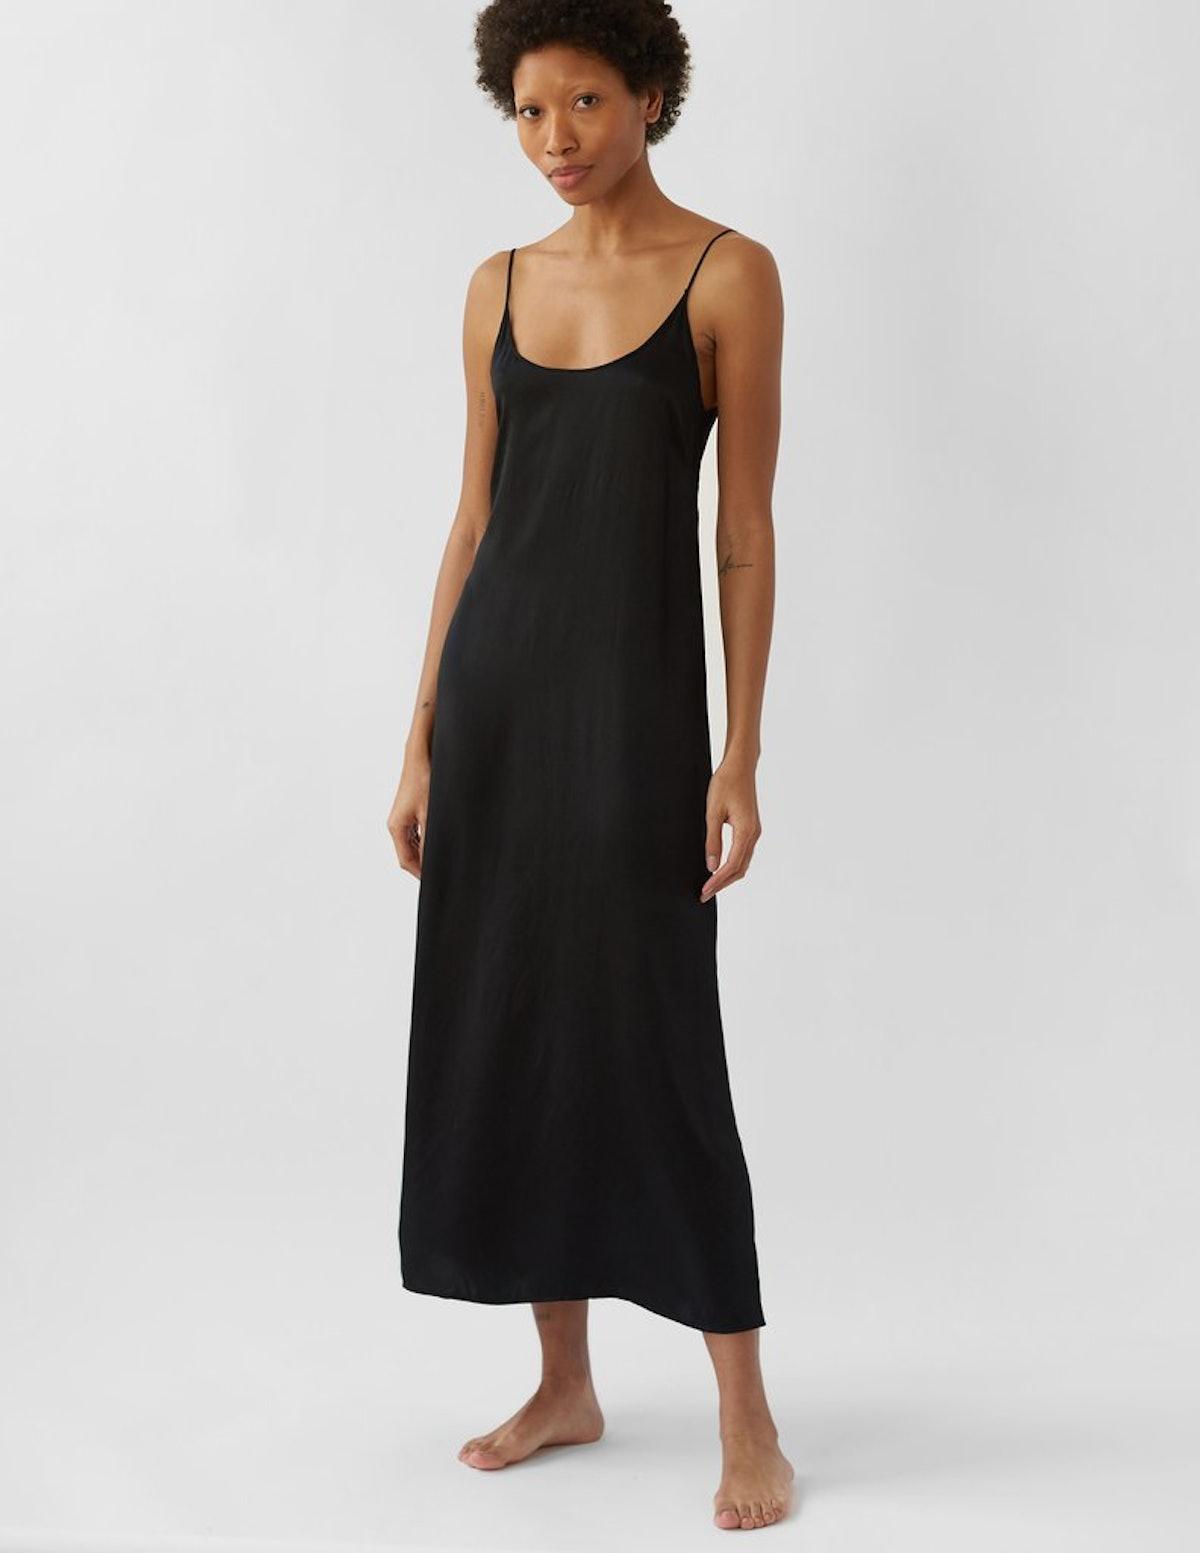 Black Quies slip dress from Araks.